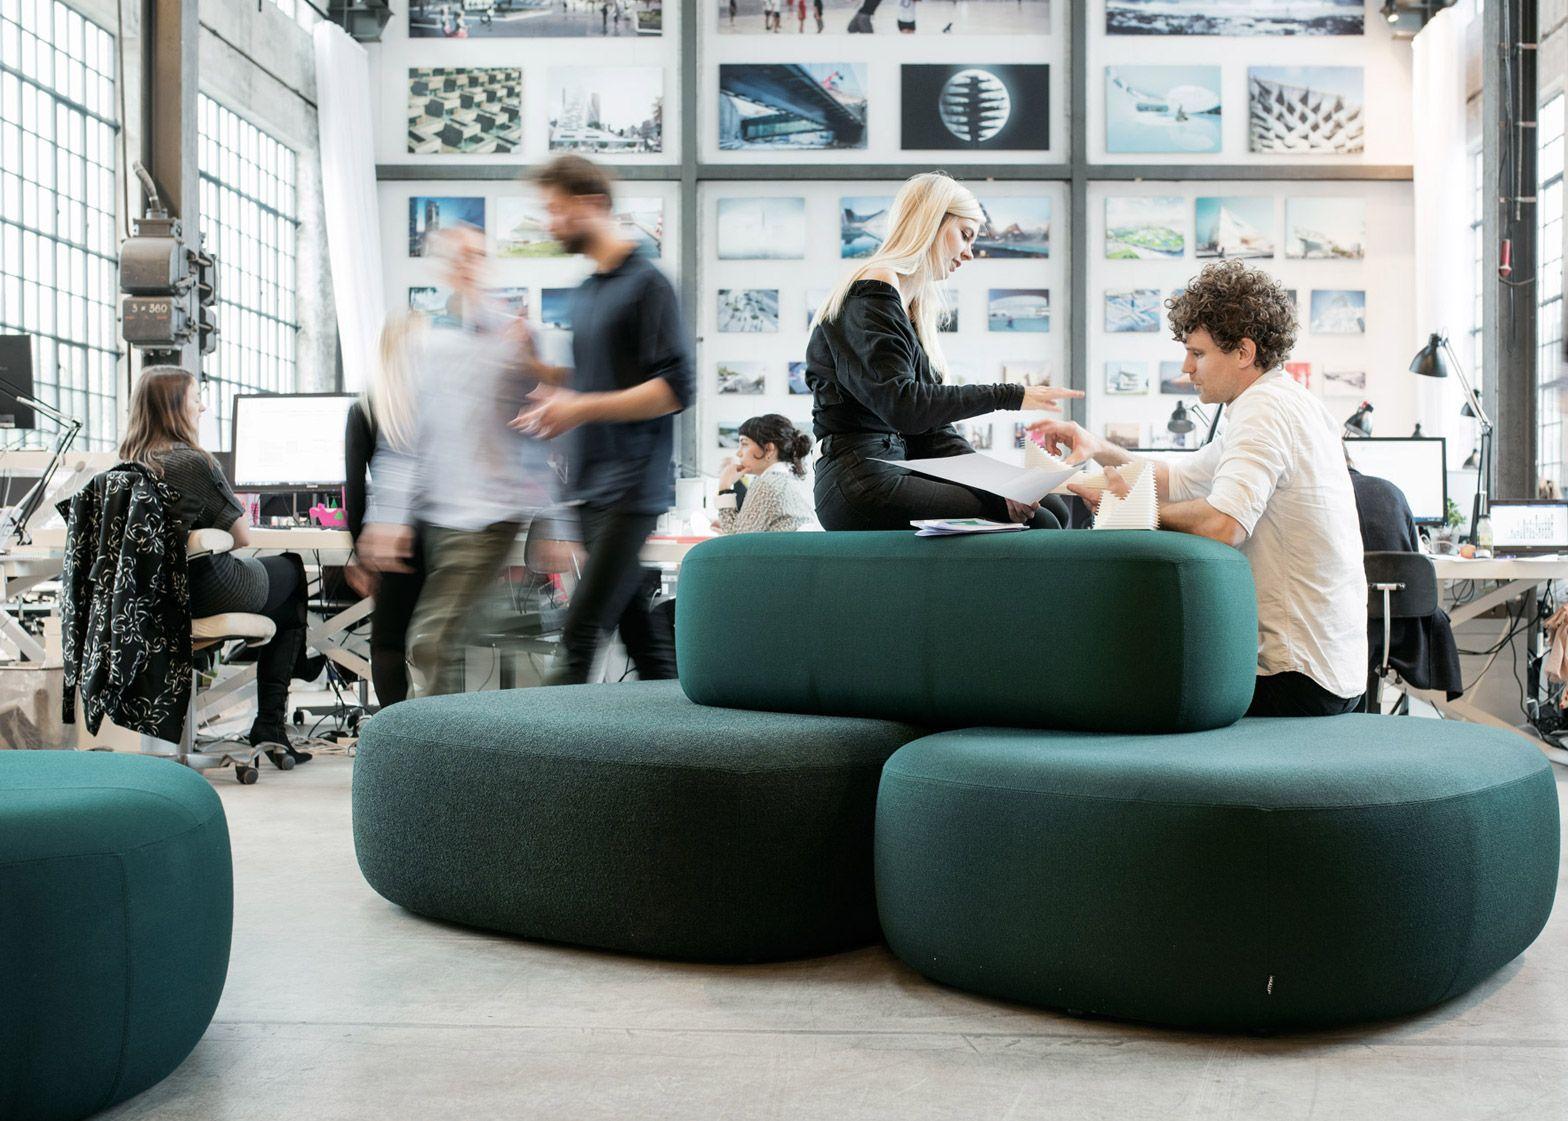 O Sofa by Kilo Design for Halle | design | Pinterest